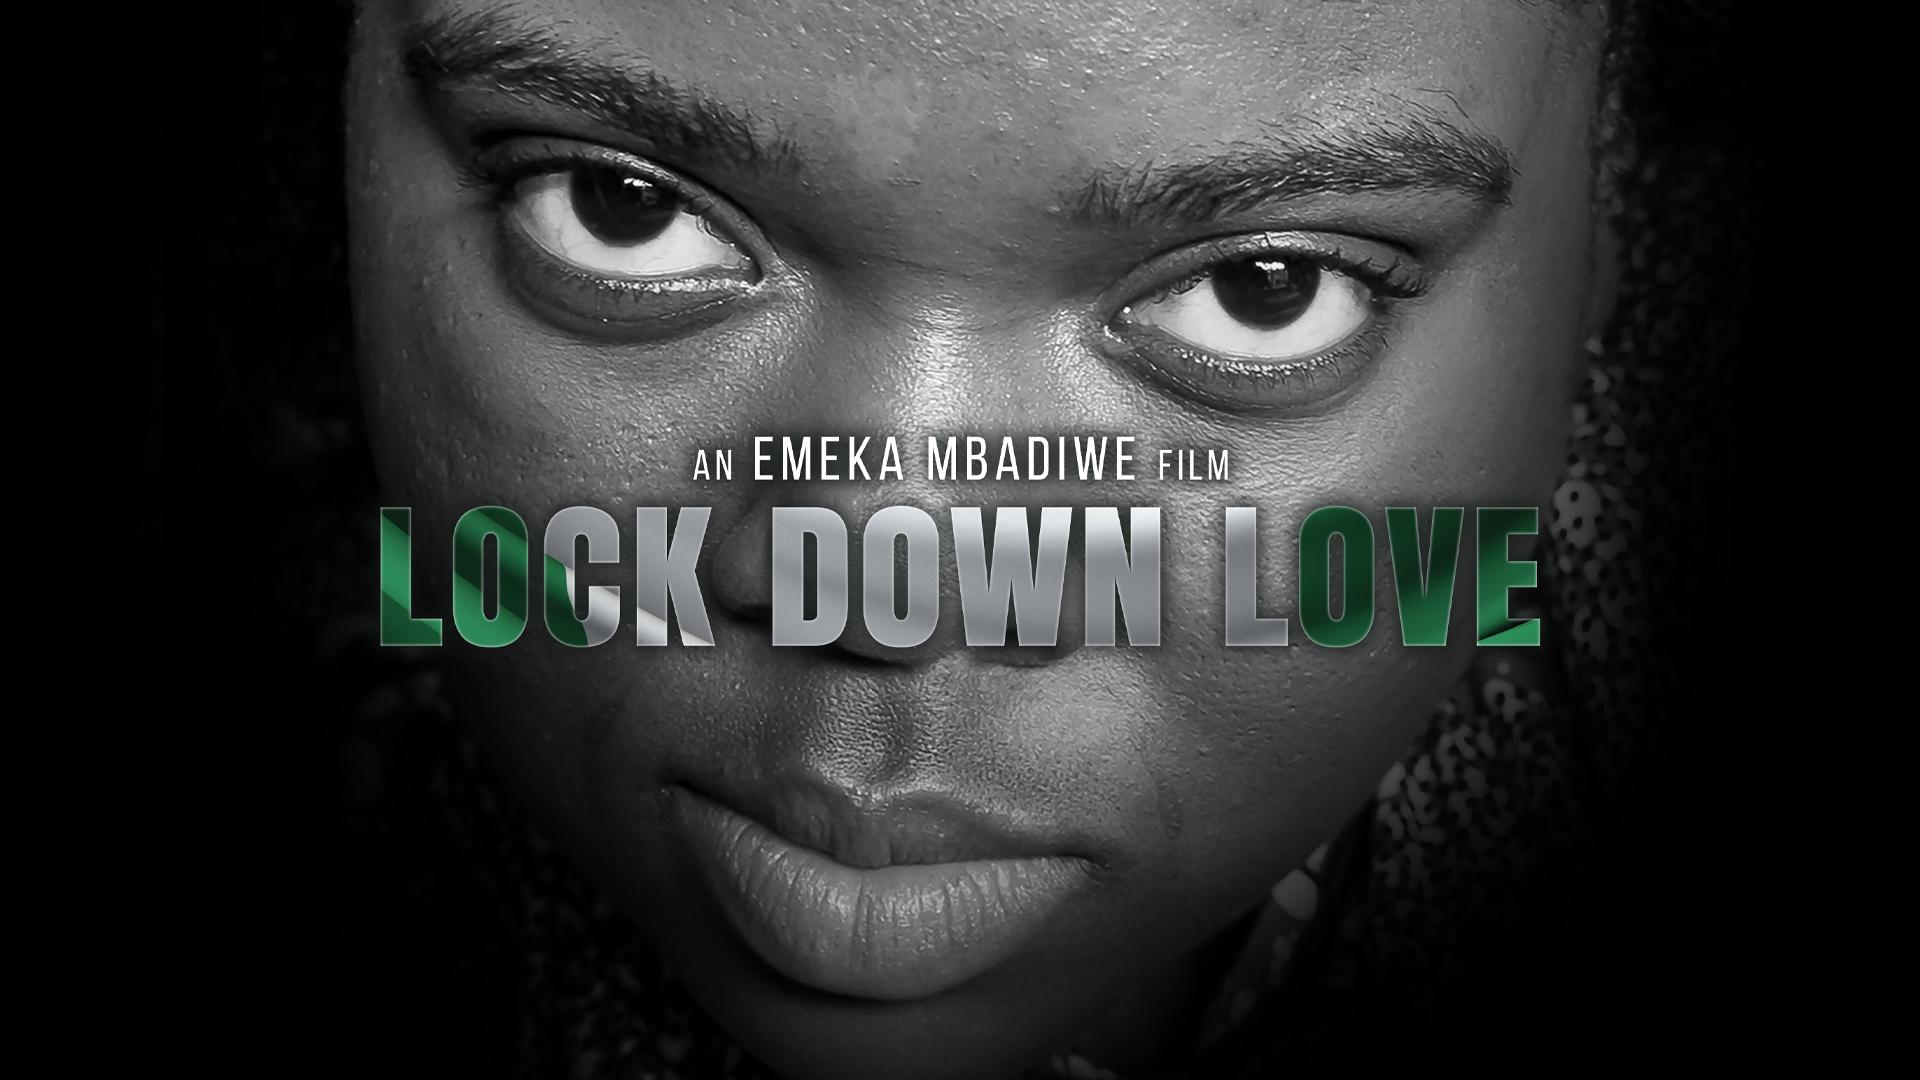 Lock Down Love